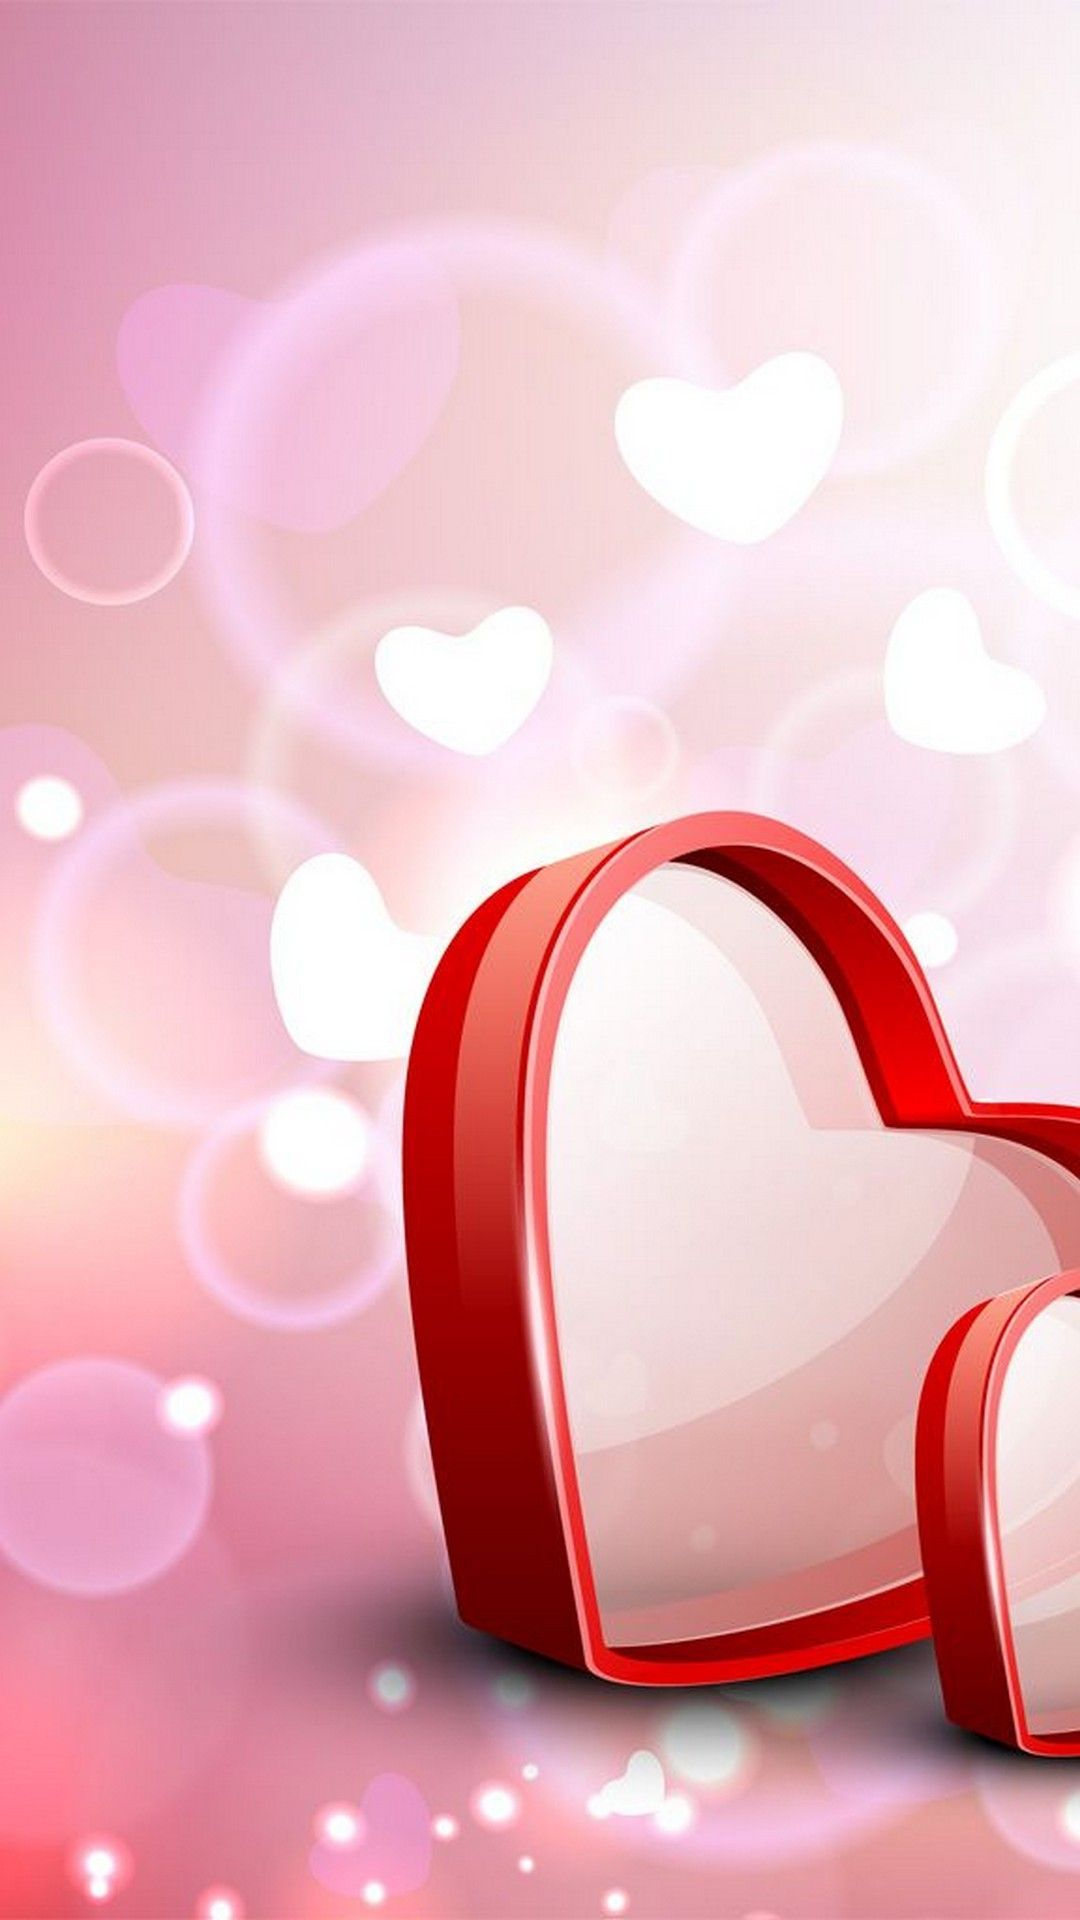 Best Love Wallpaper Download Free 4k Wallpapers Images Love Wallpaper Download Love Wallpaper Android Wallpaper Android love wallpaper download